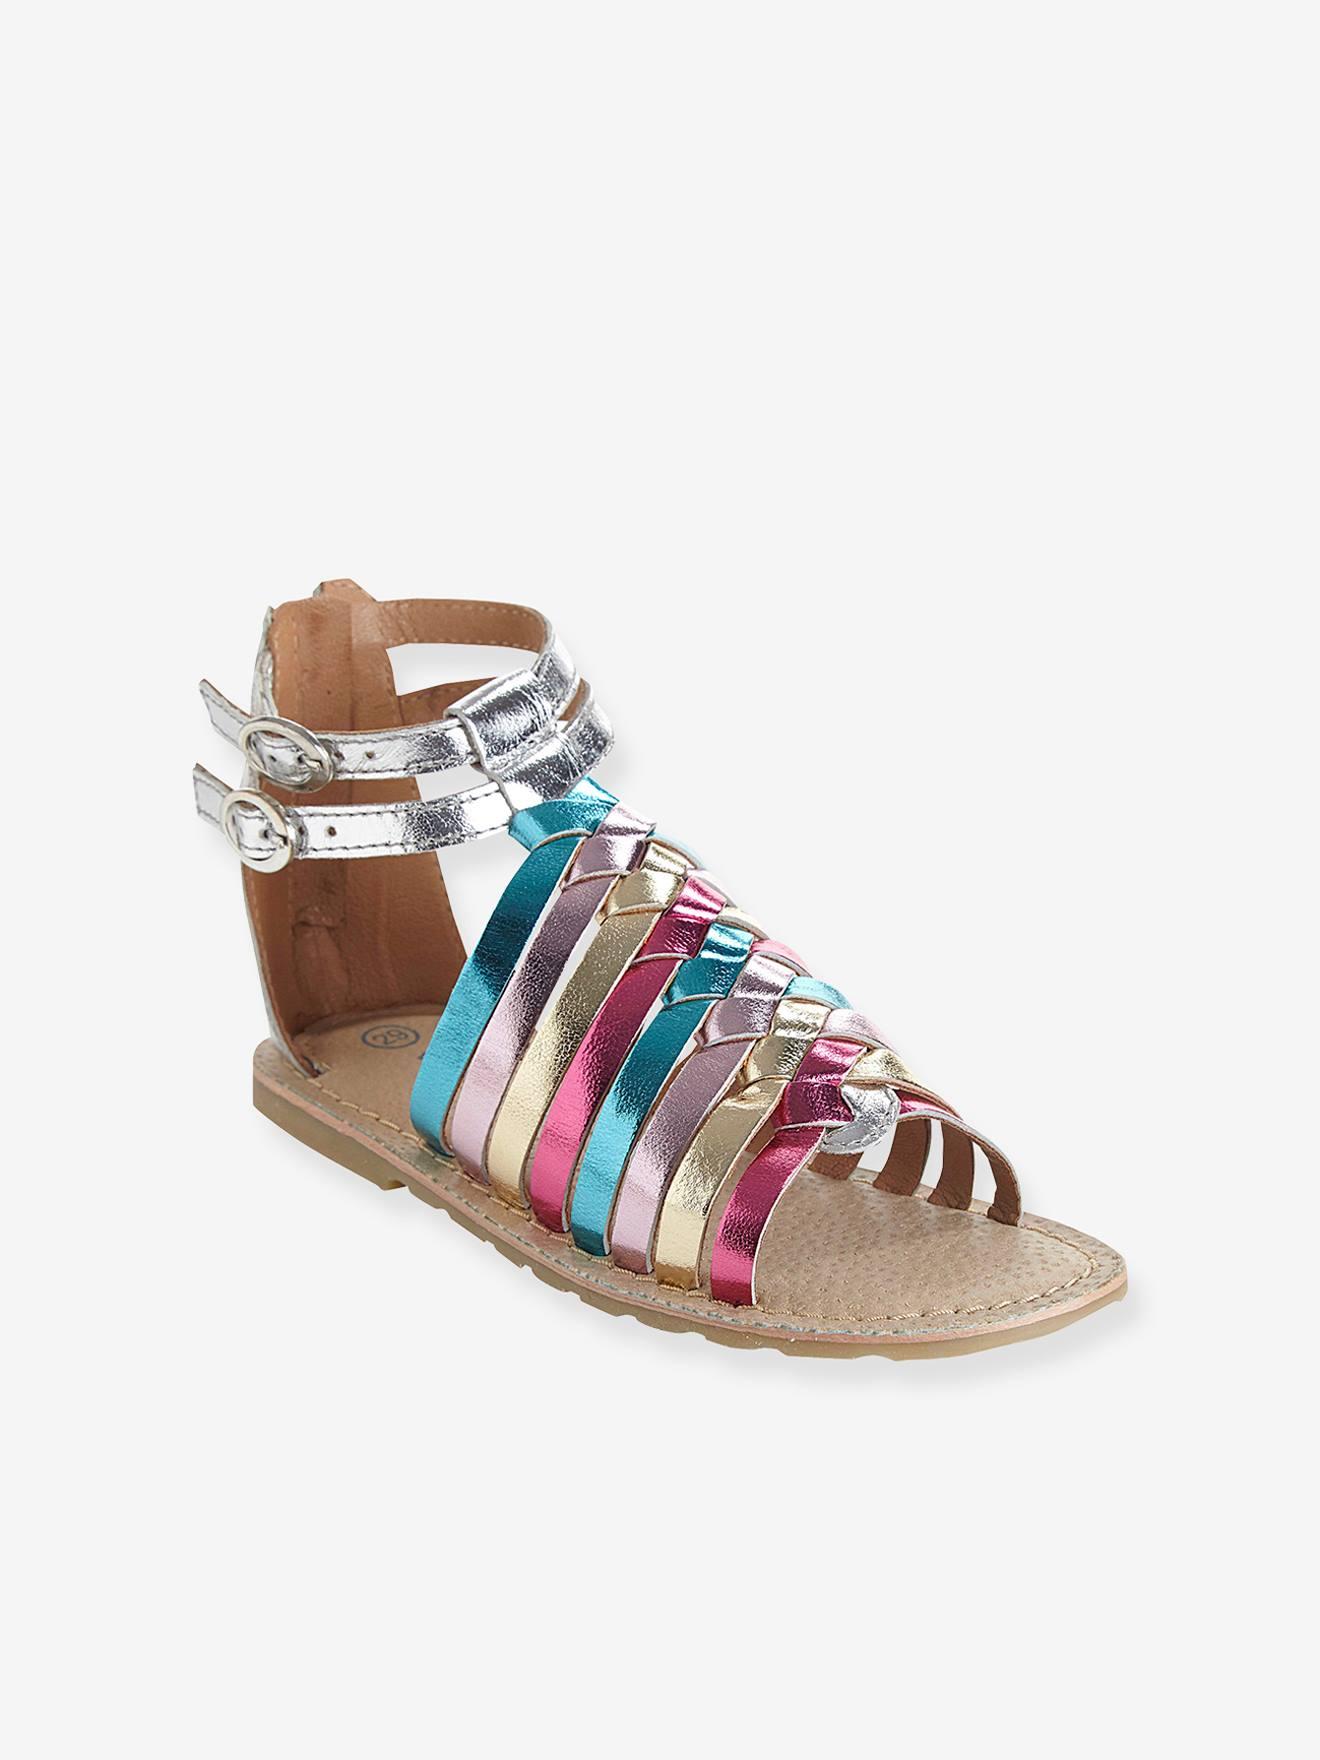 Römer-Sandalen für Mädchen, Leder goldrosa